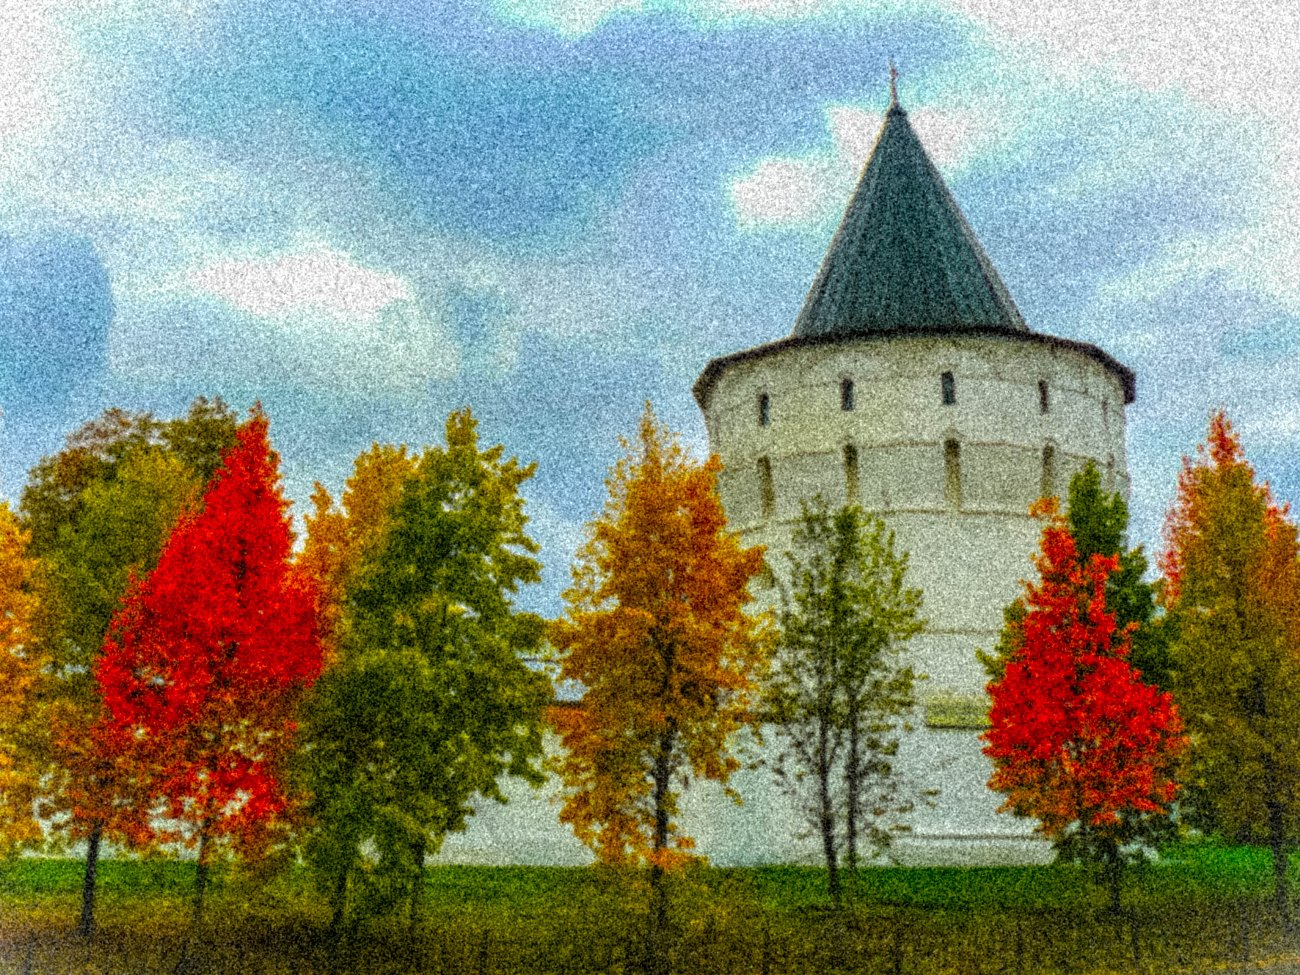 irina-fortuna=Novospassky-Monastery 05.jpg